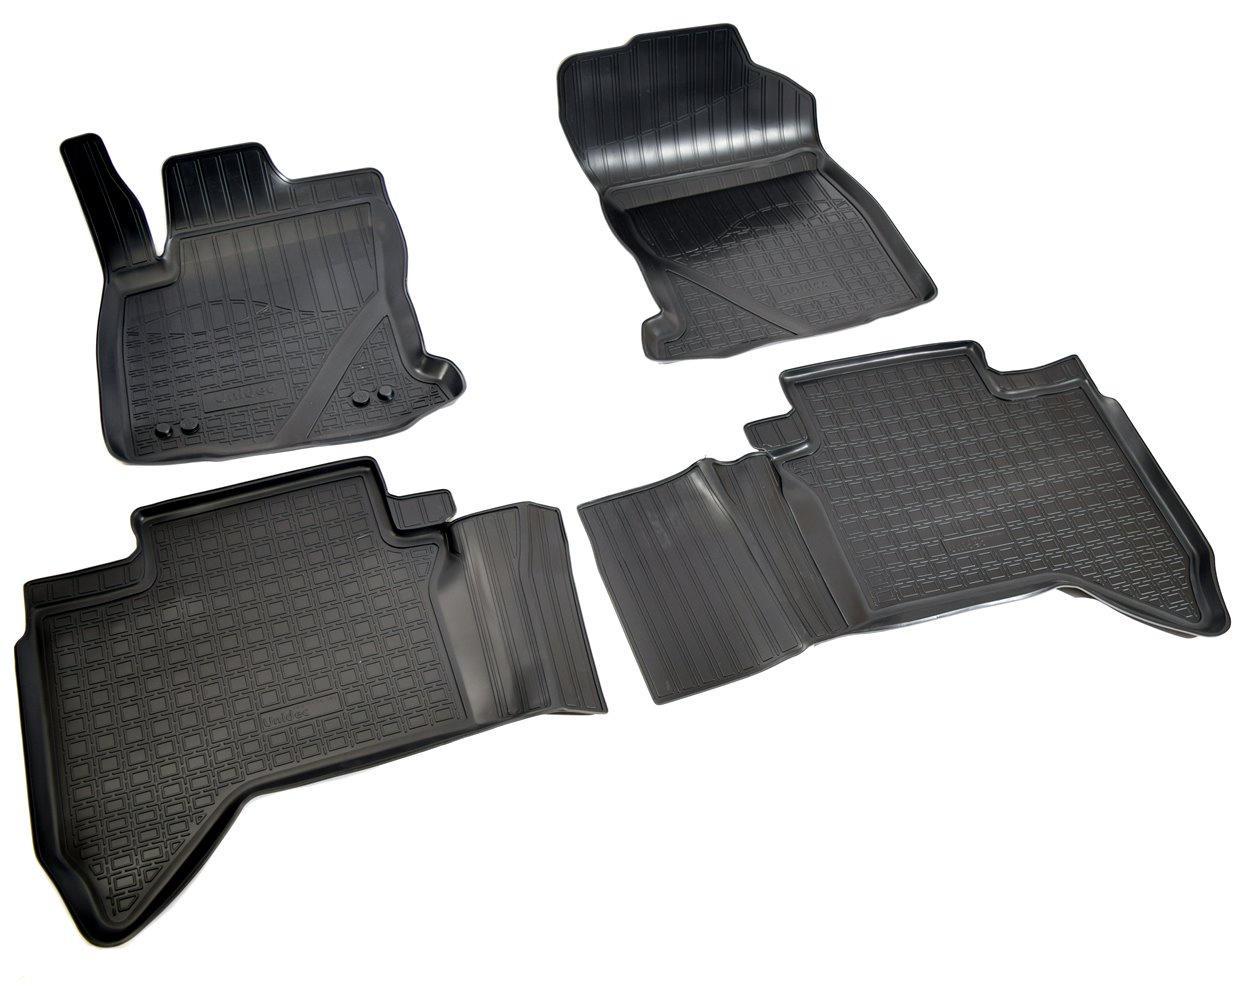 Коврики салона Norplast для Toyota Hilux 2015, NPA11-C88-360, черный yaopei new 28551 0t010 modulo central eletrica for 2015 toyota hilux 28436027